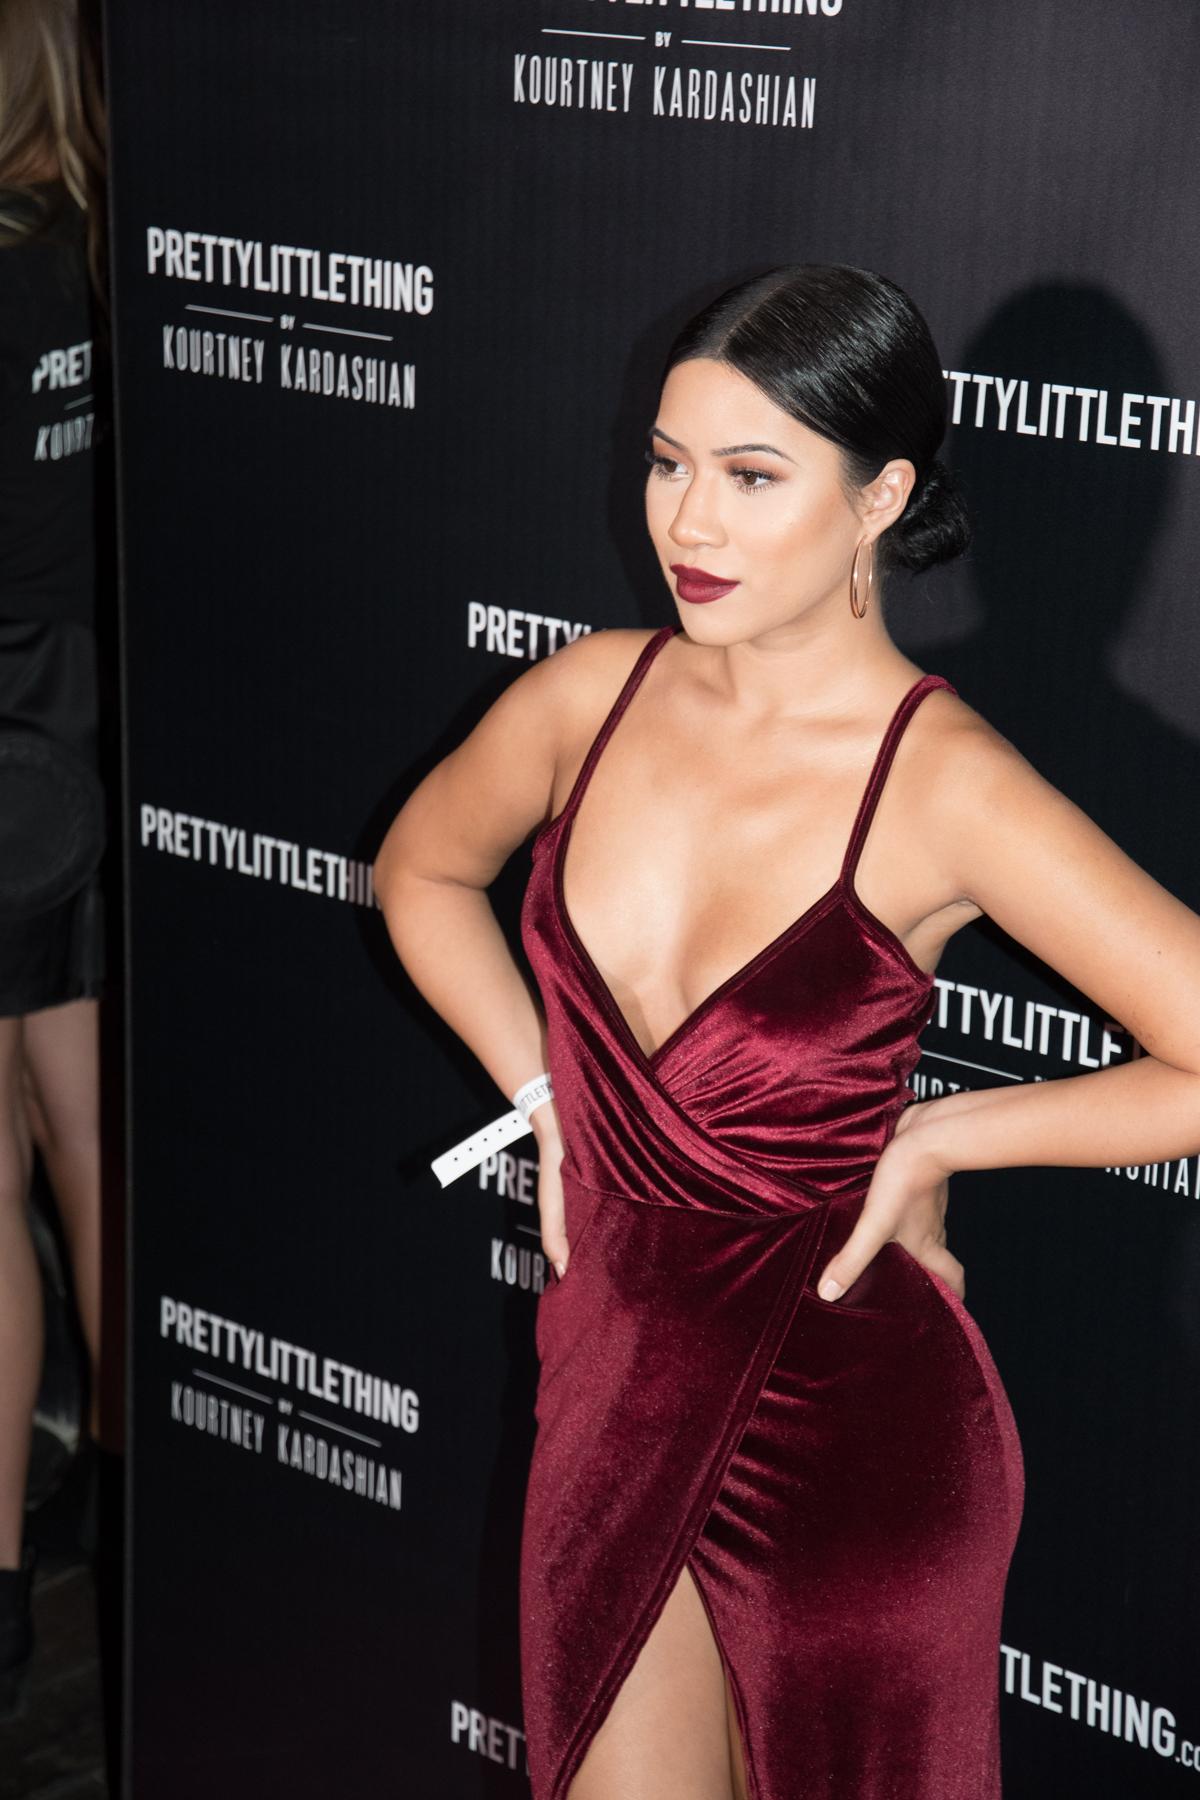 PrettyLittleThing PLT X Kourtney Kardashian Collection Celebrity Launch Party Julia Kelly.jpg